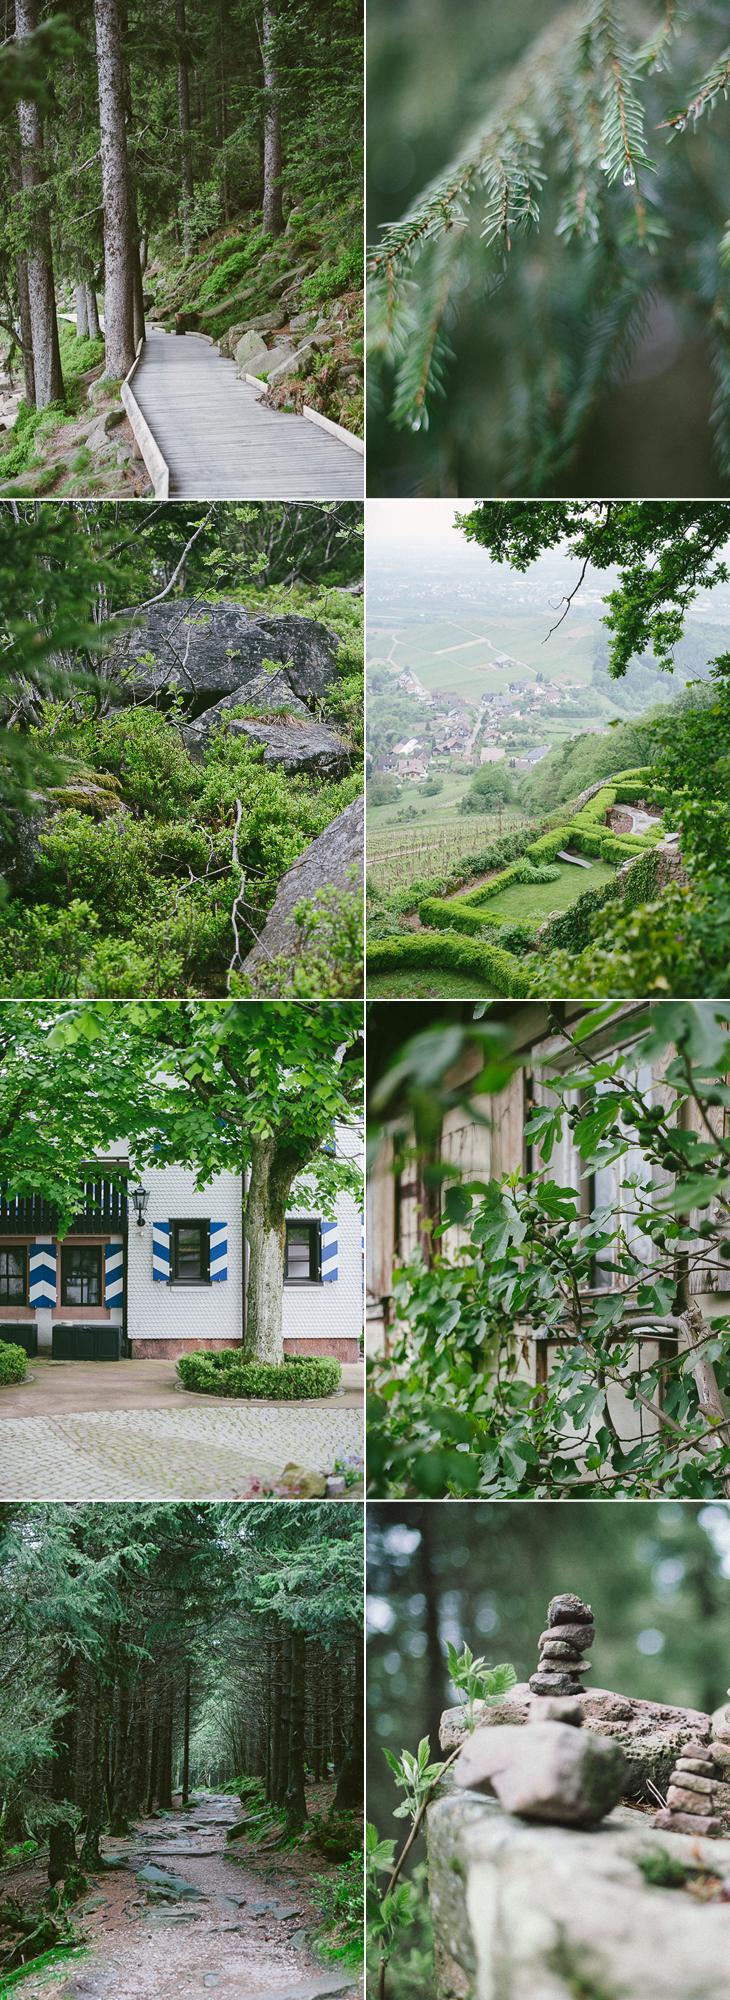 Tour im Nordschwarzwald Mummelsee Kazja Heil